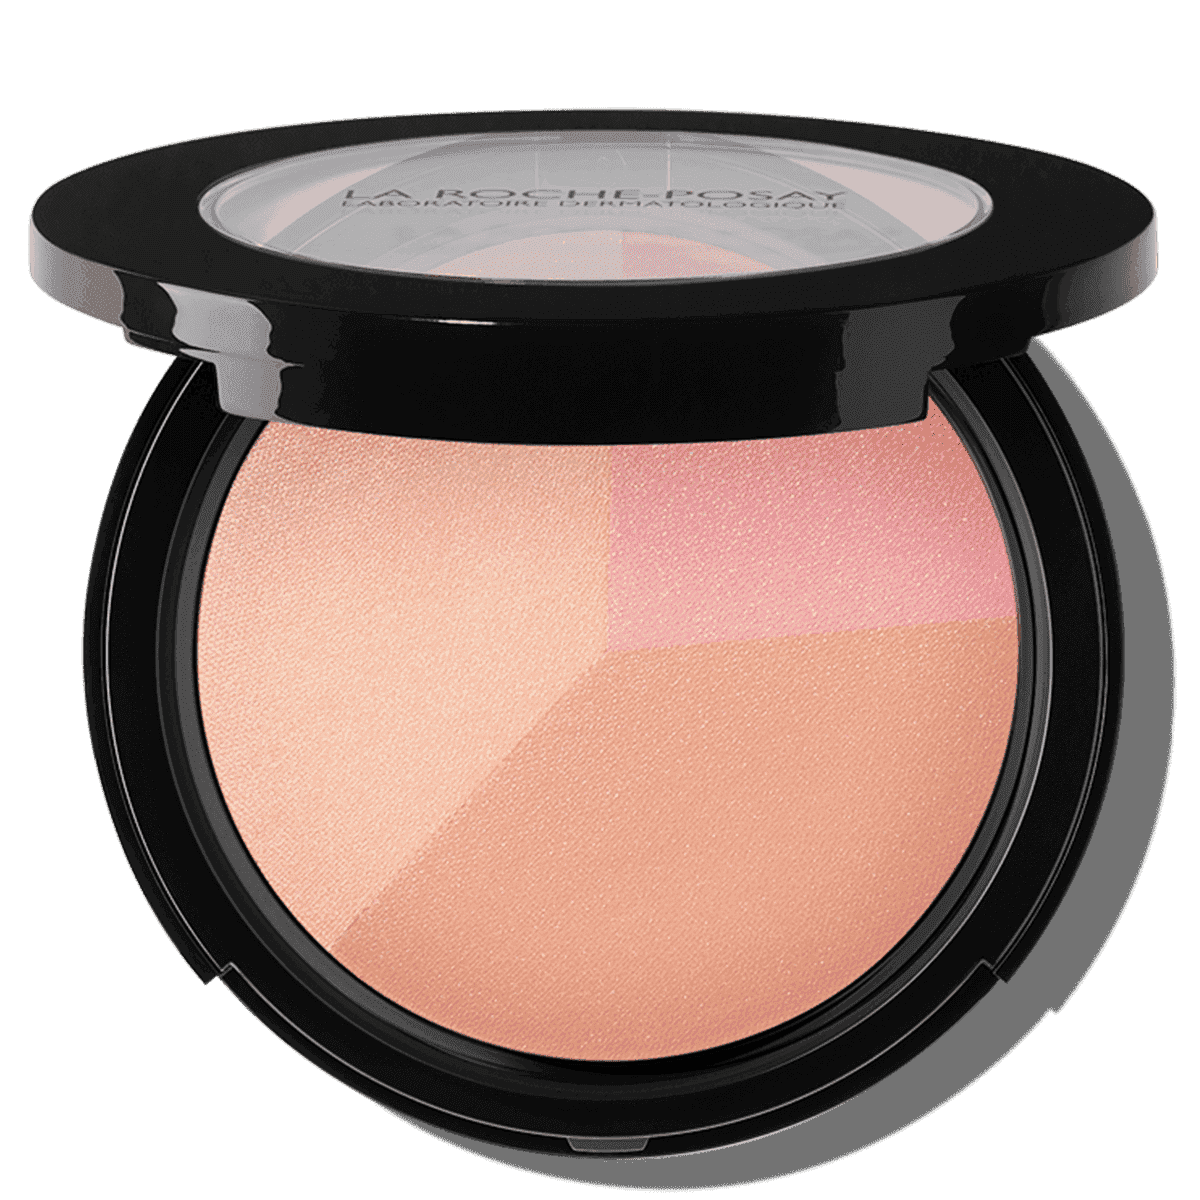 La Roche-Posay Sensitive Toleriane Make-up TEINT Fixation 3337872413780